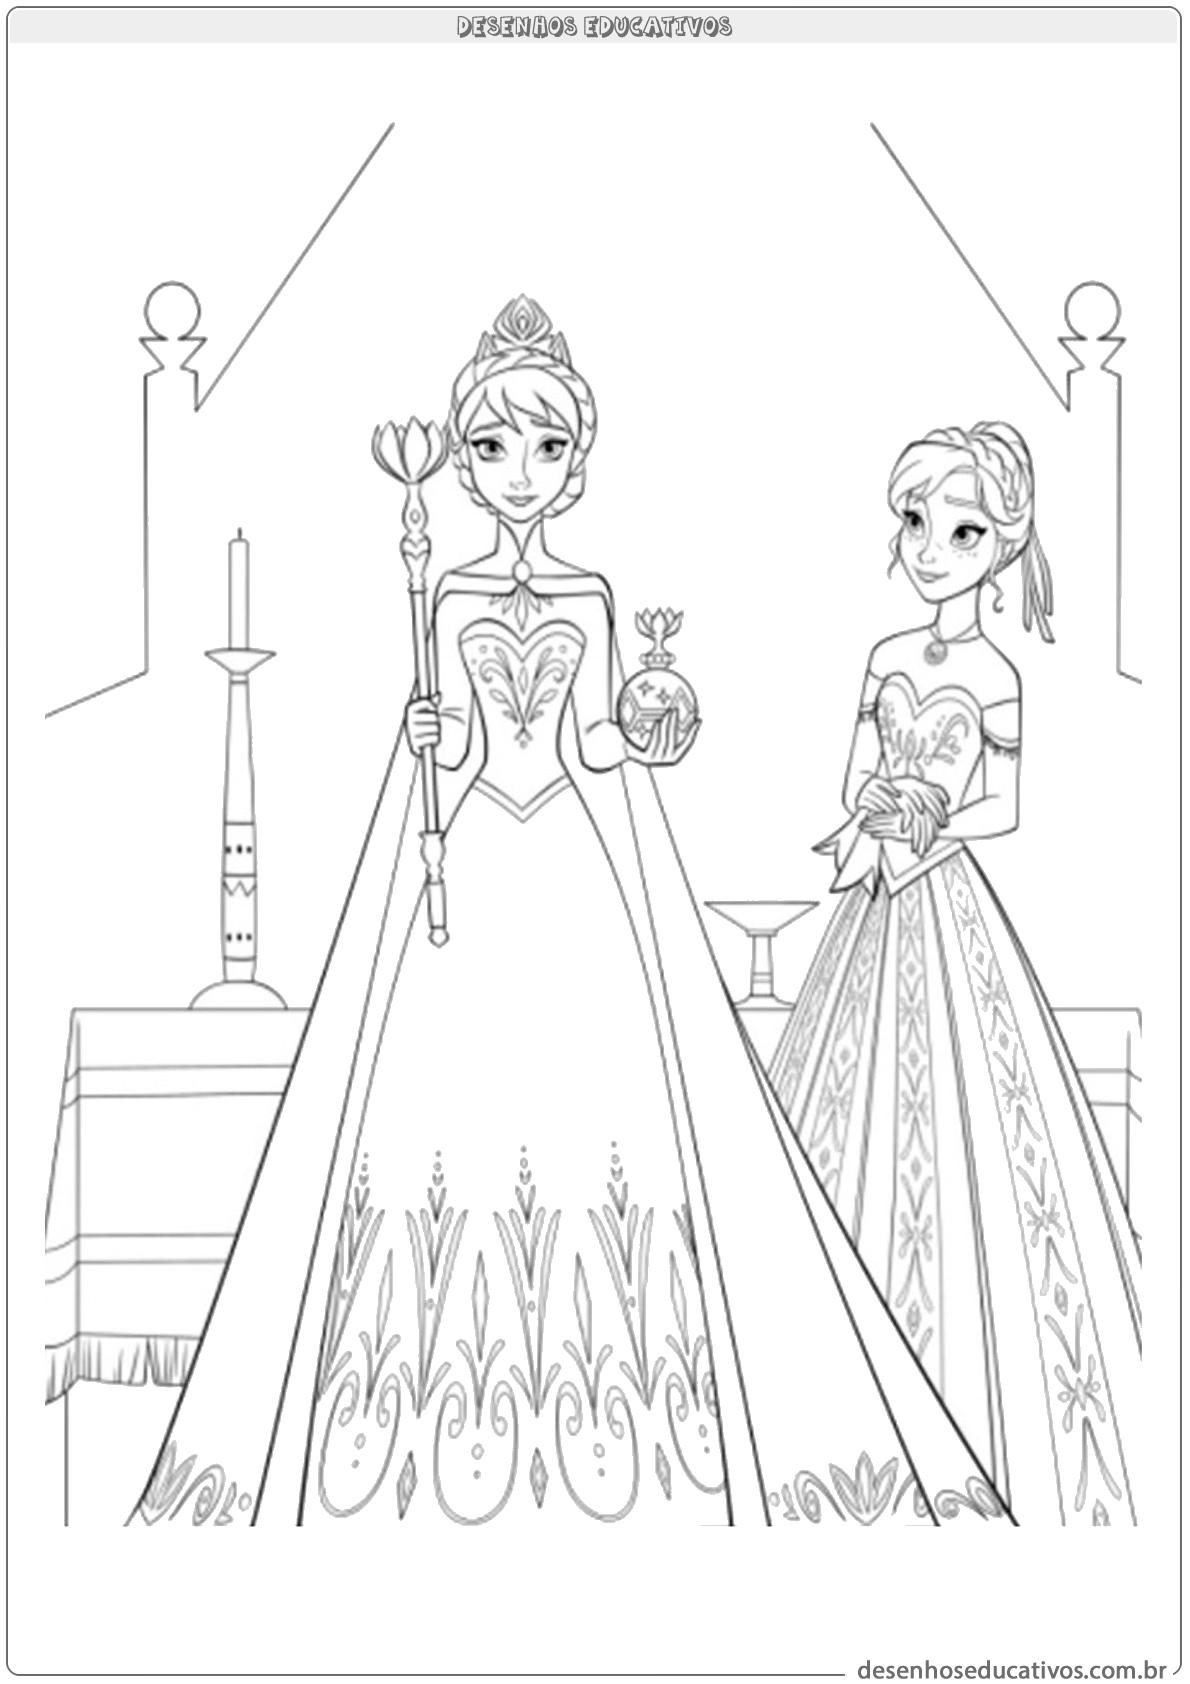 Desenhos Educativos Frozen Ana E Elsa Desenhos Educativos